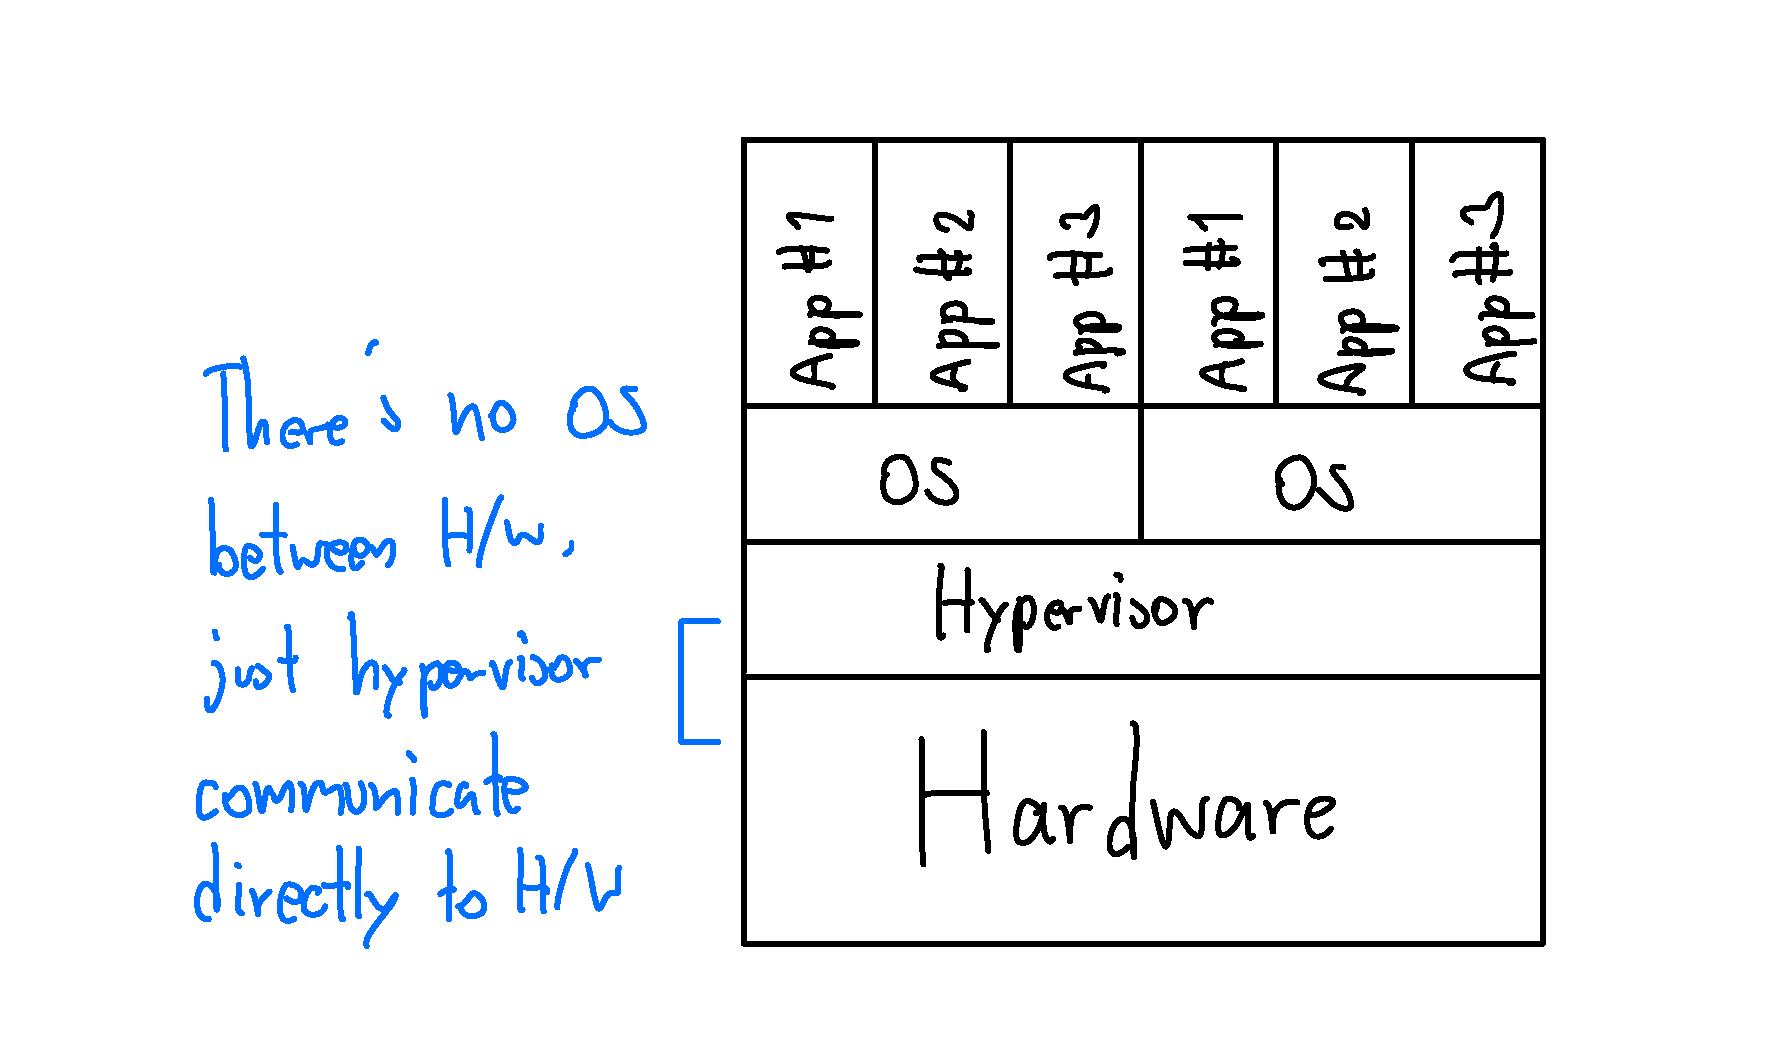 Virtual Machine Type 1 Hypervisor